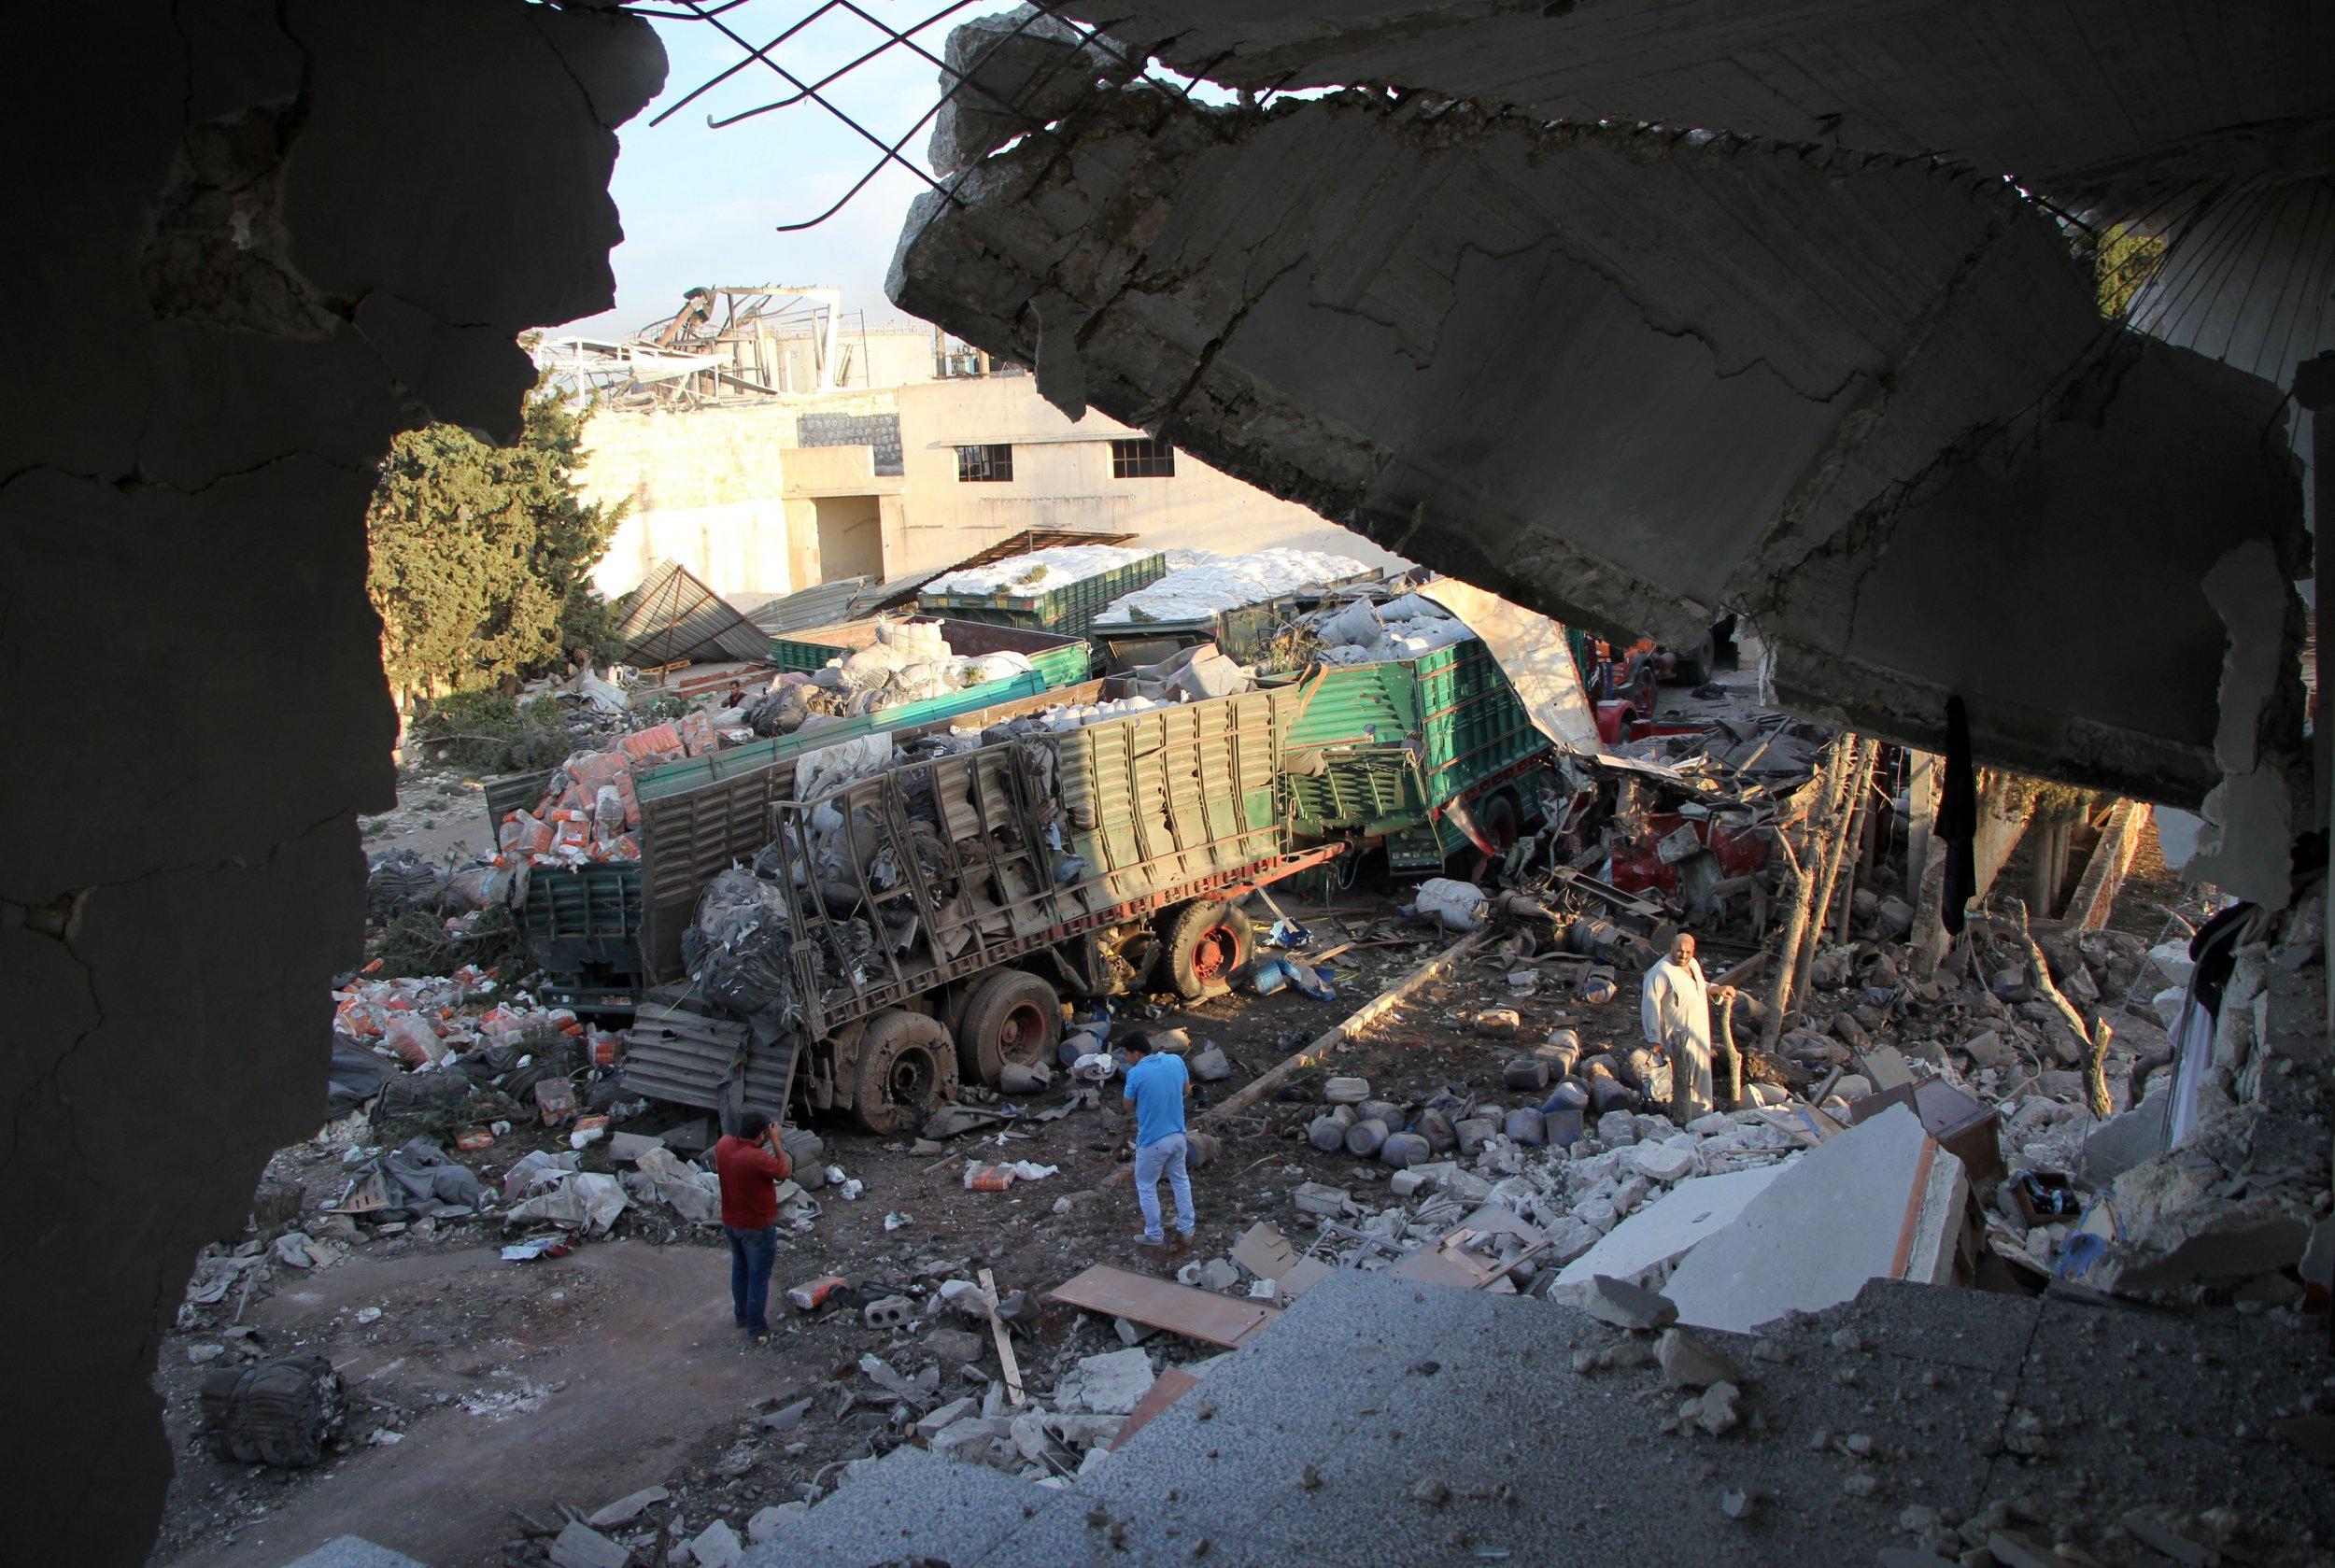 Aftermath of aid convoy strike